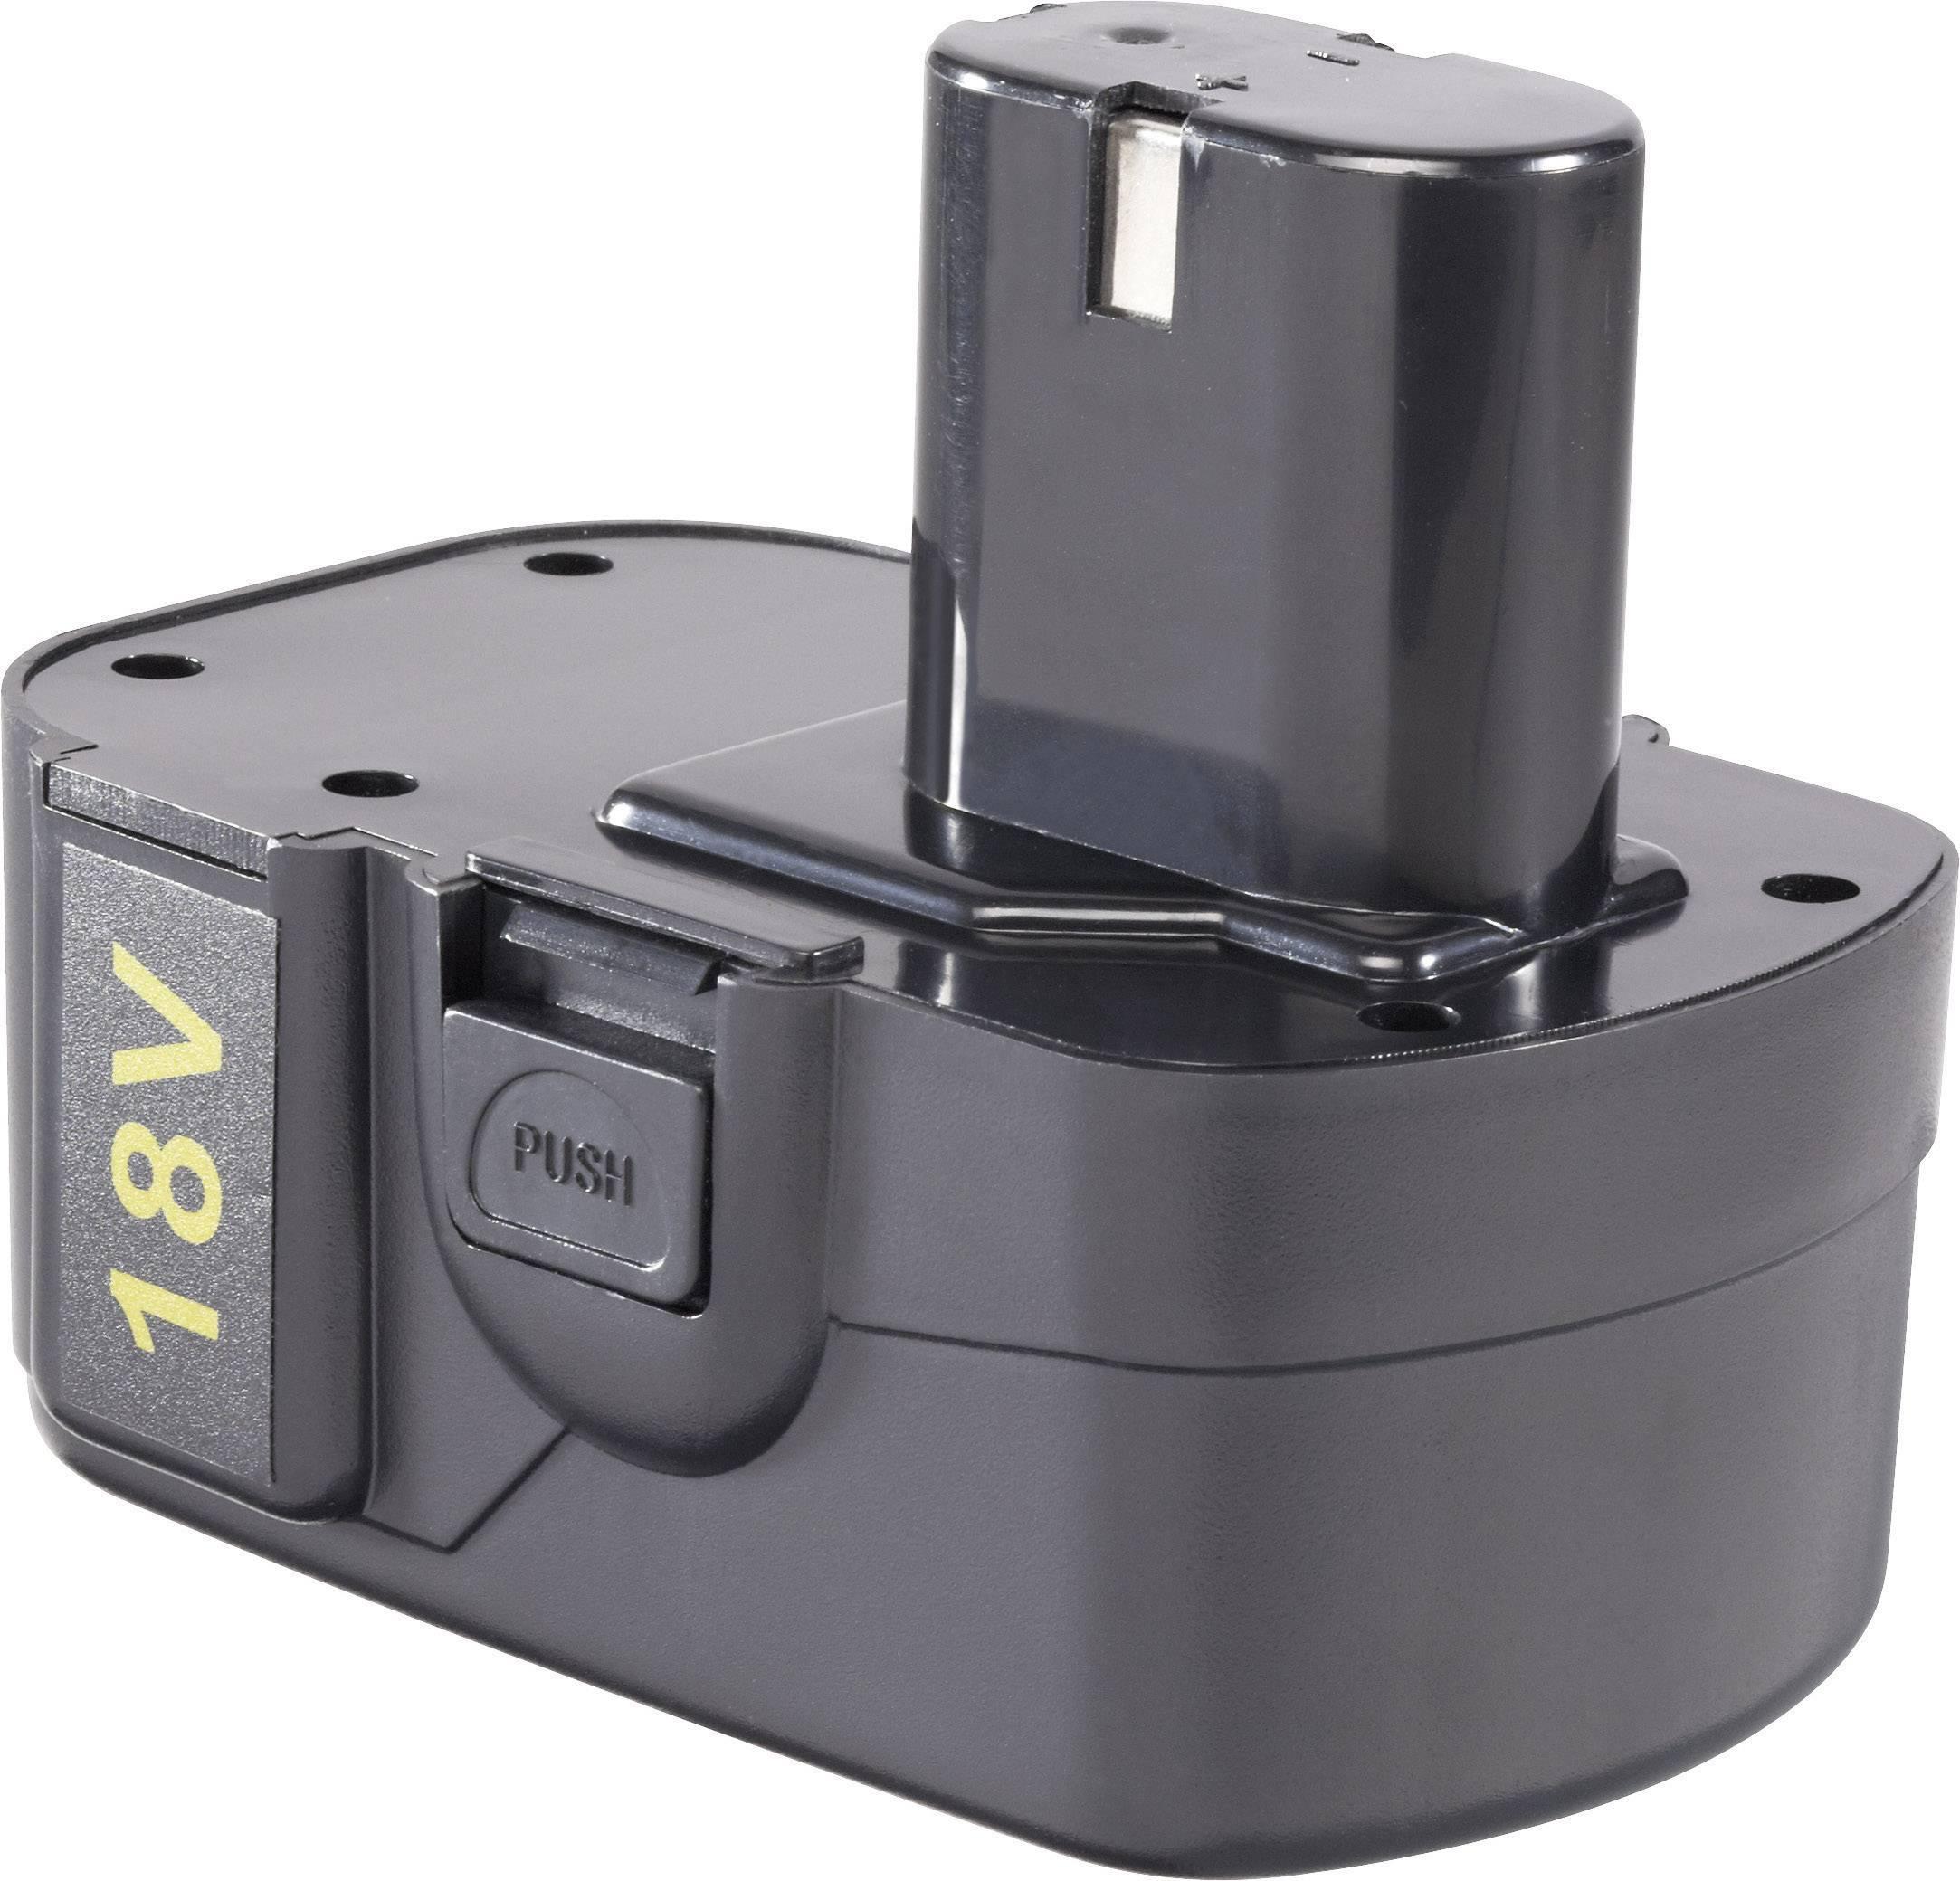 Náhradní akumulátor pro elektrické nářadí, Brüder Mannesmann M1799-18-E, 18 V, 1.2 Ah, Ni-Cd